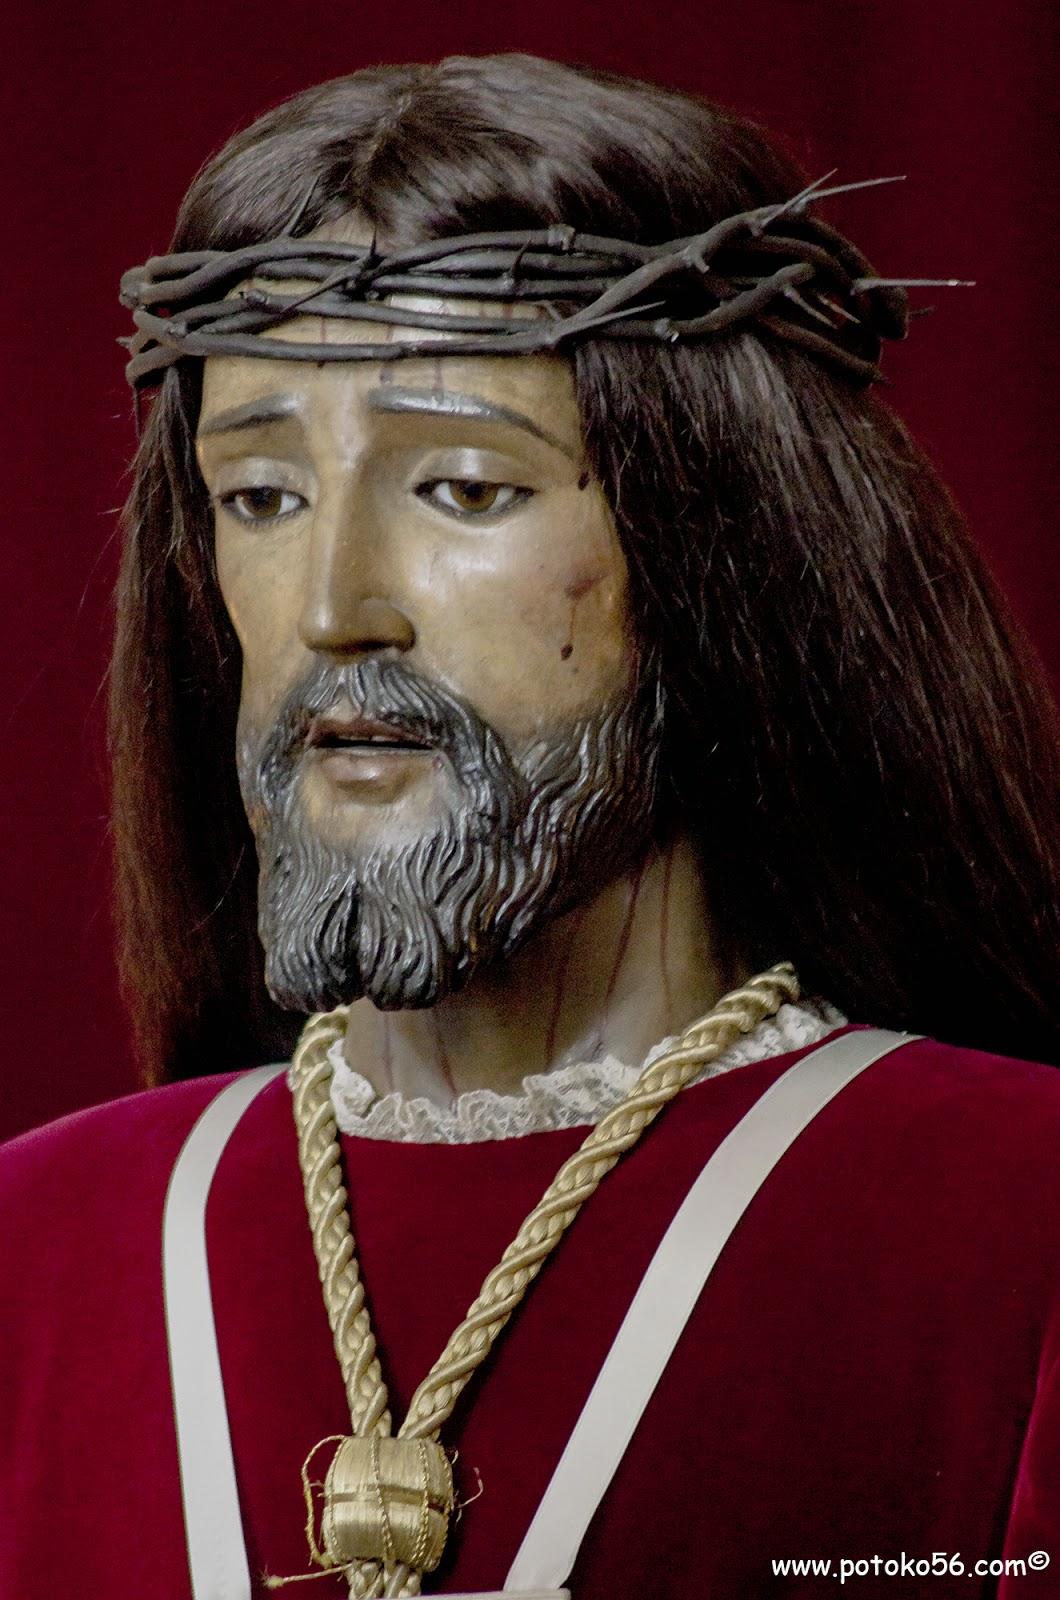 Iglesia de San Roque Ntro. Padre Jesús Cautivo y Rescatado Rota